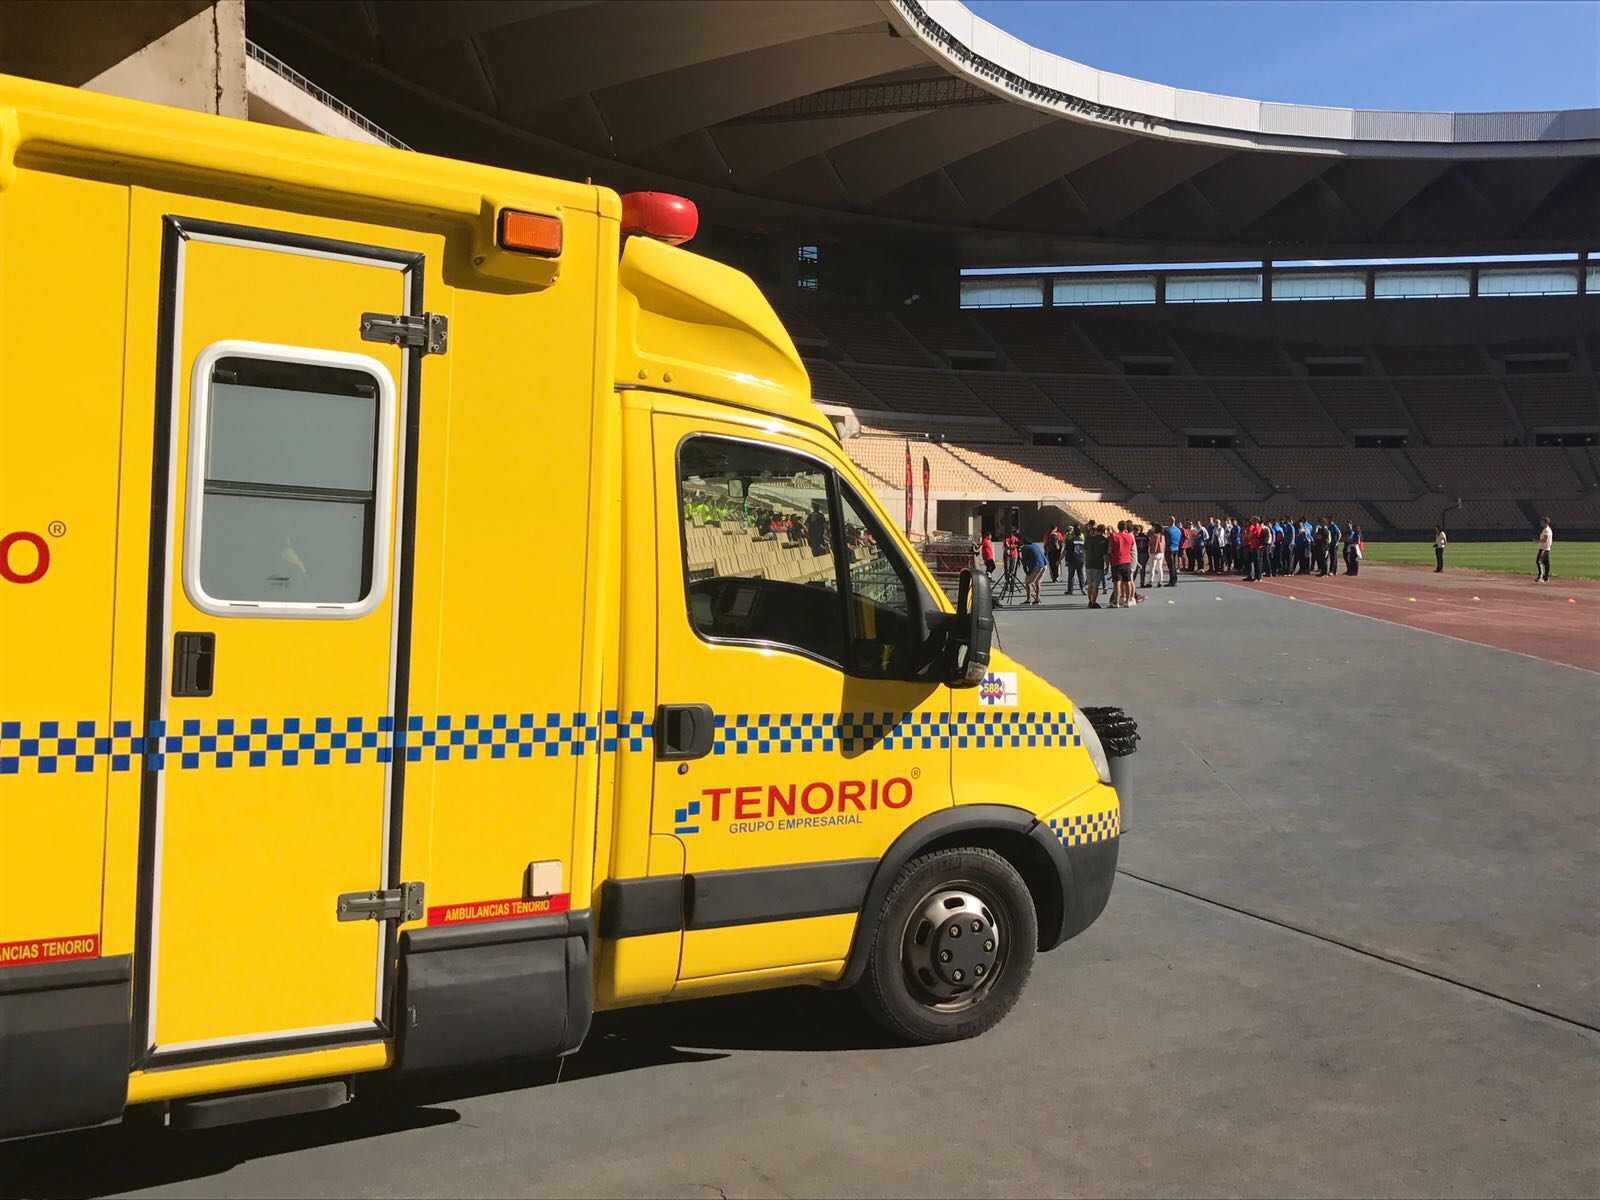 Ambulancias Tenorio ha colaborado en la I Miniolimpiadas Interteco